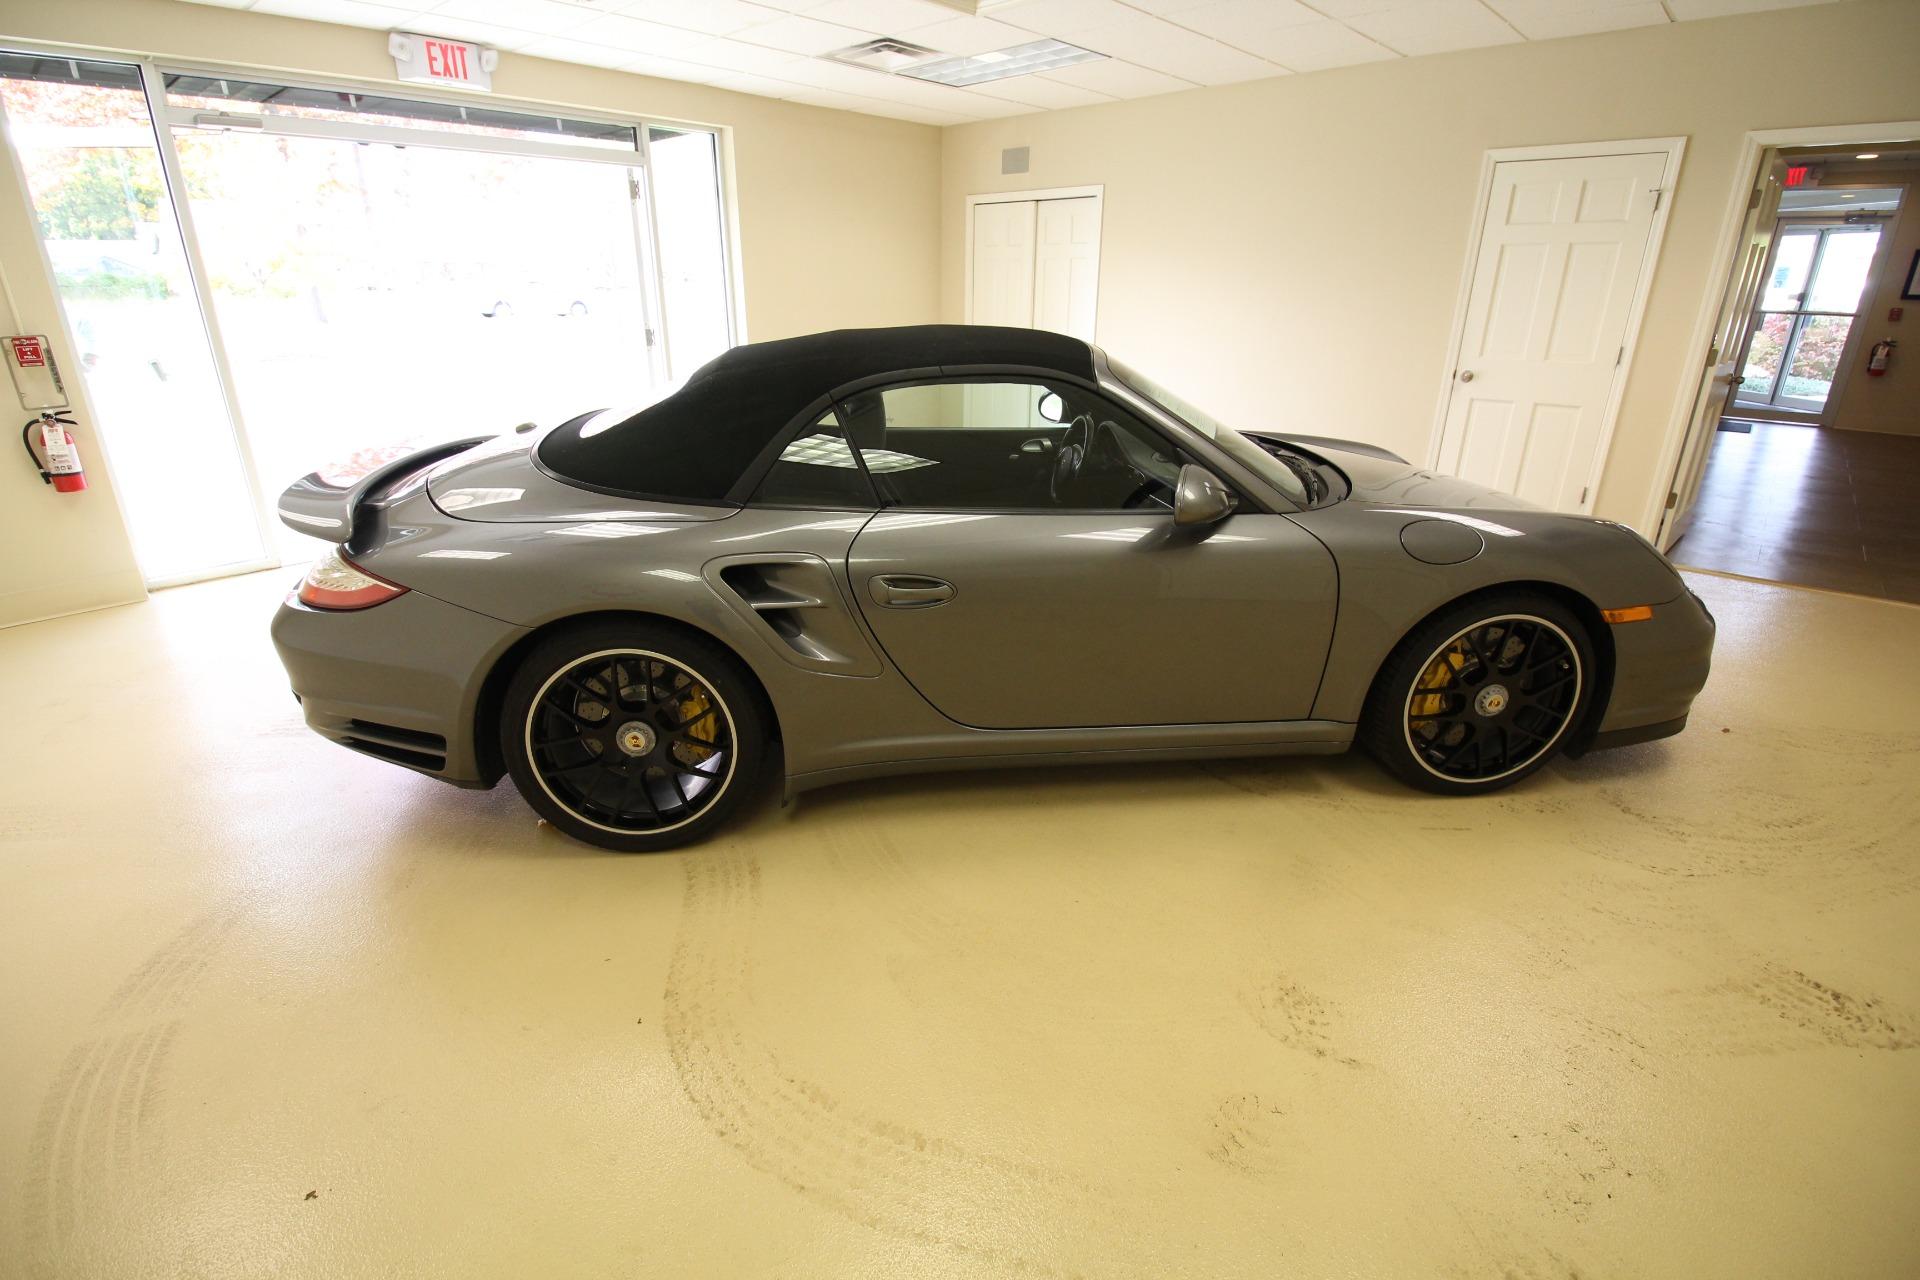 Used 2012 Porsche 911 Turbo S Cabriolet PDK SUPER NICE LOCAL TRADE FOR FERRARI | Albany, NY